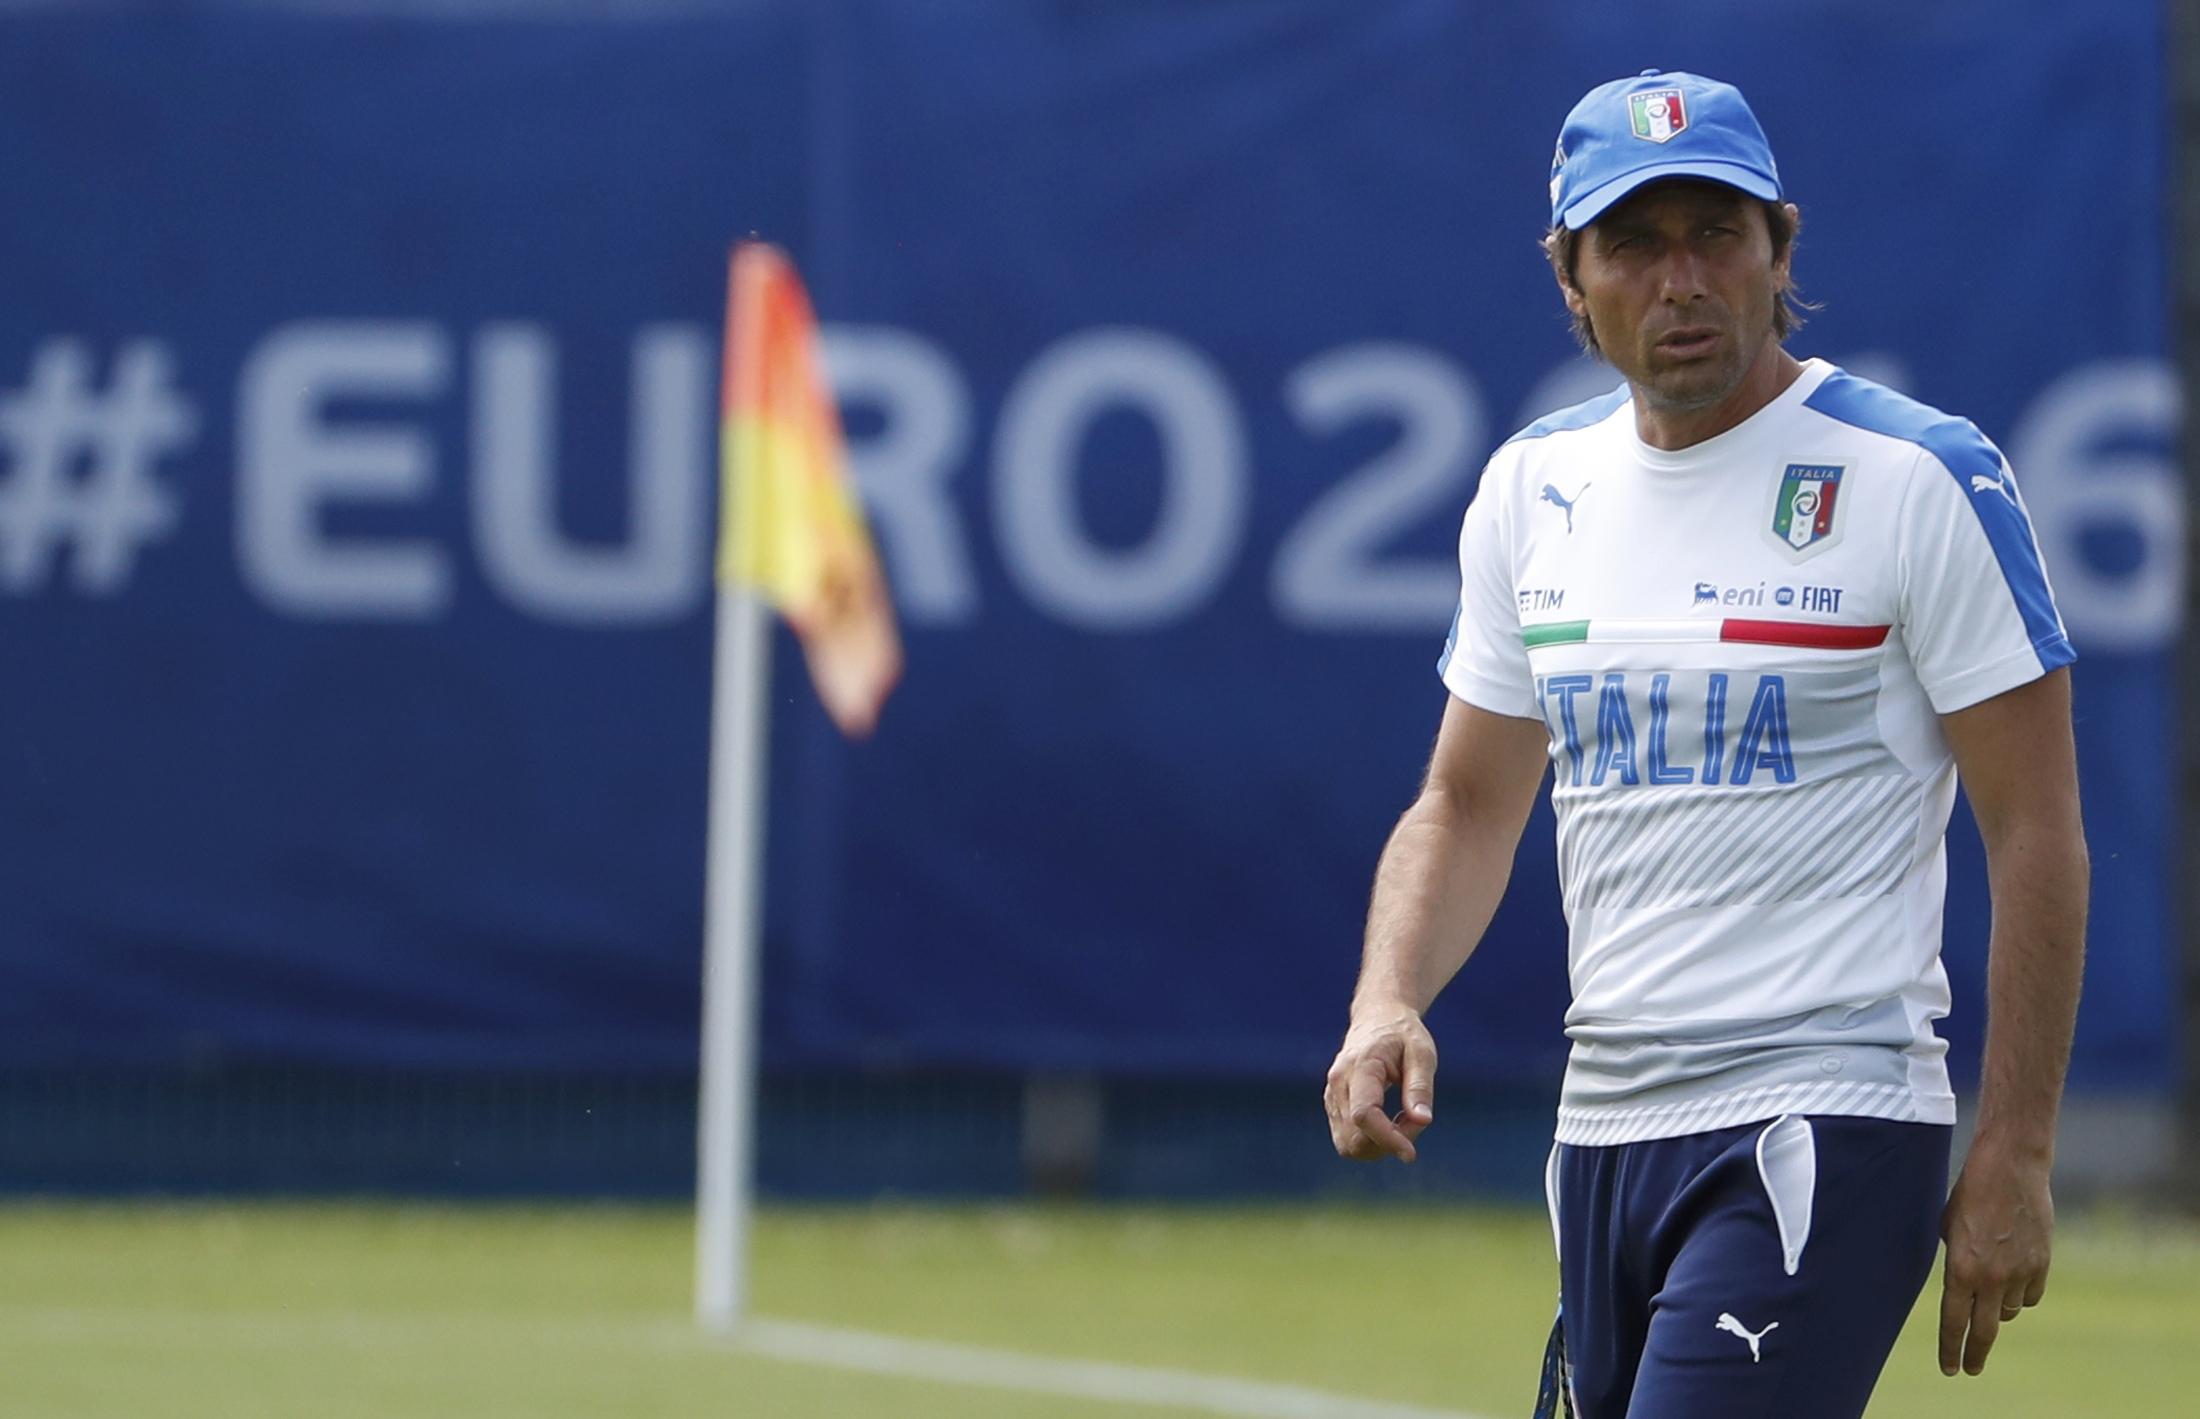 Football - Euro 2016 - Conte, la vraie star de l'équipe d'Italie